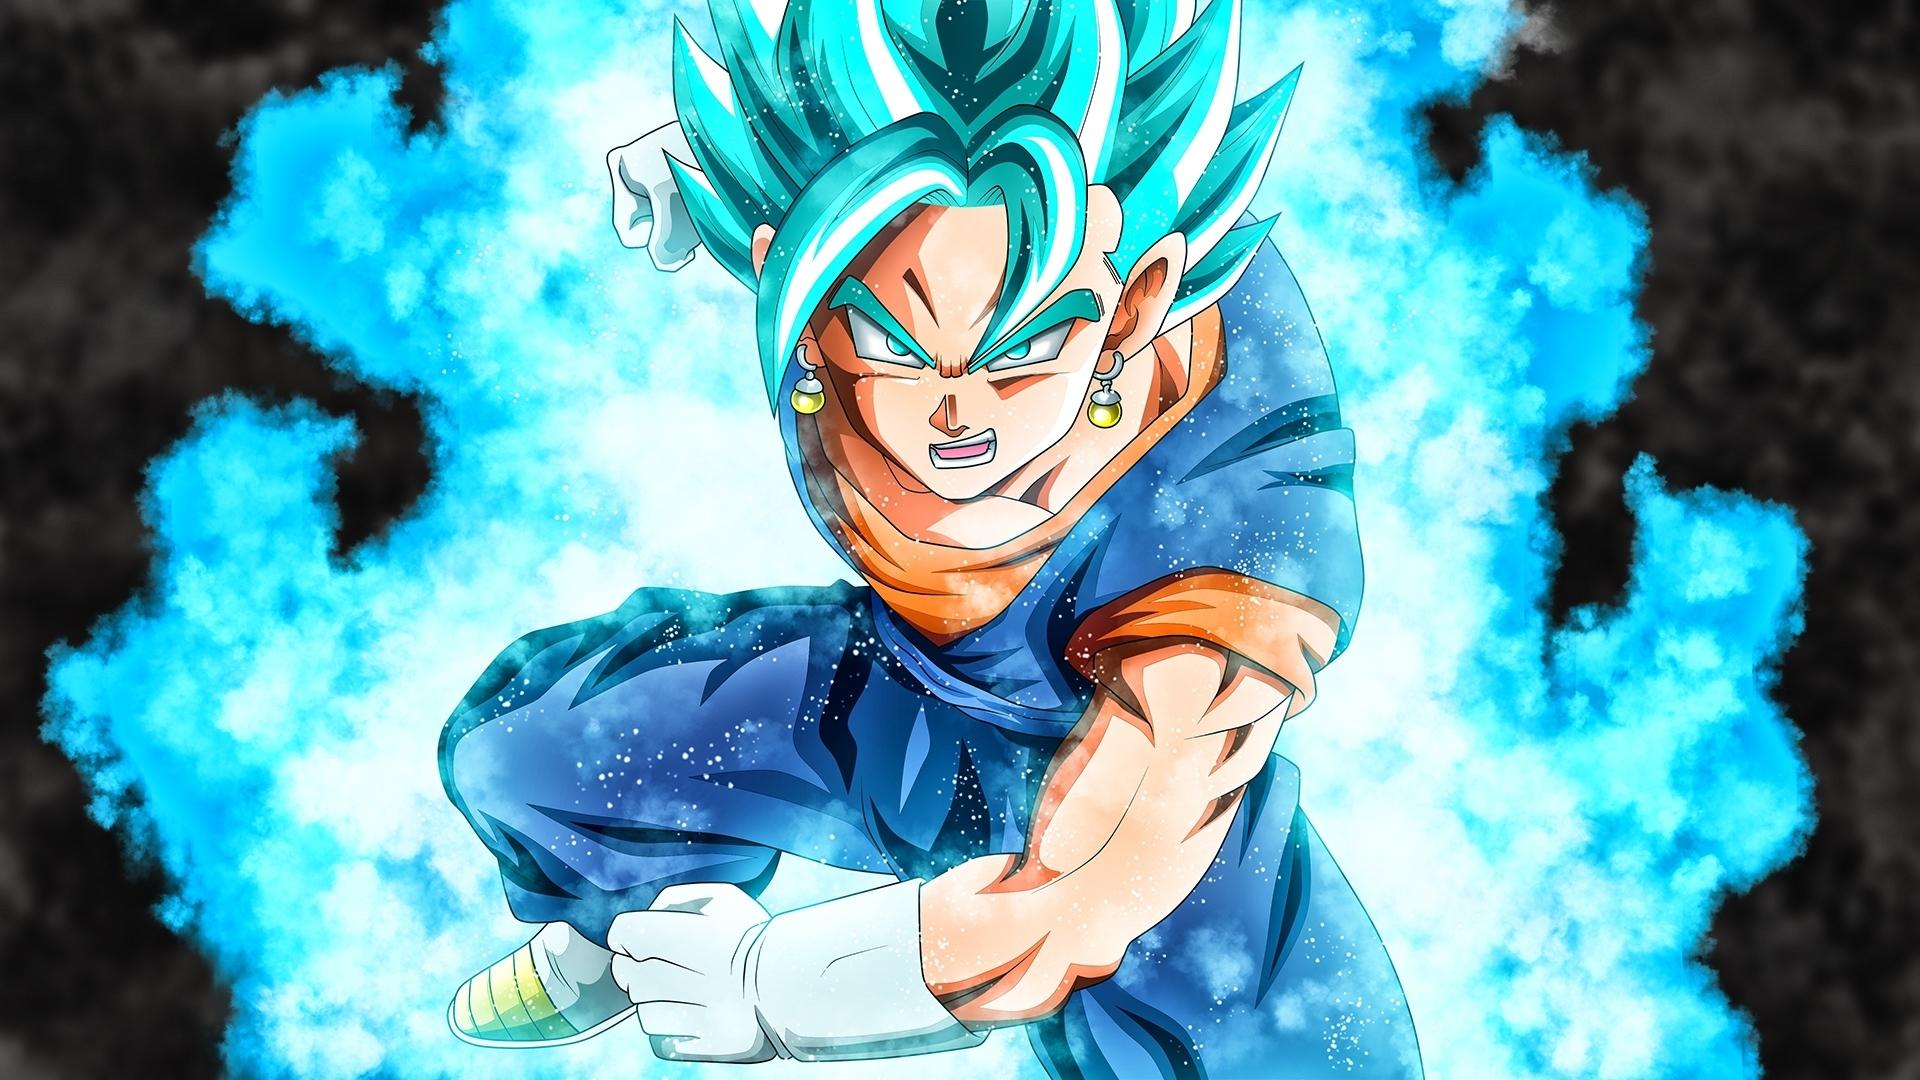 vegito super saiyan blue dbs wallpaper #39966